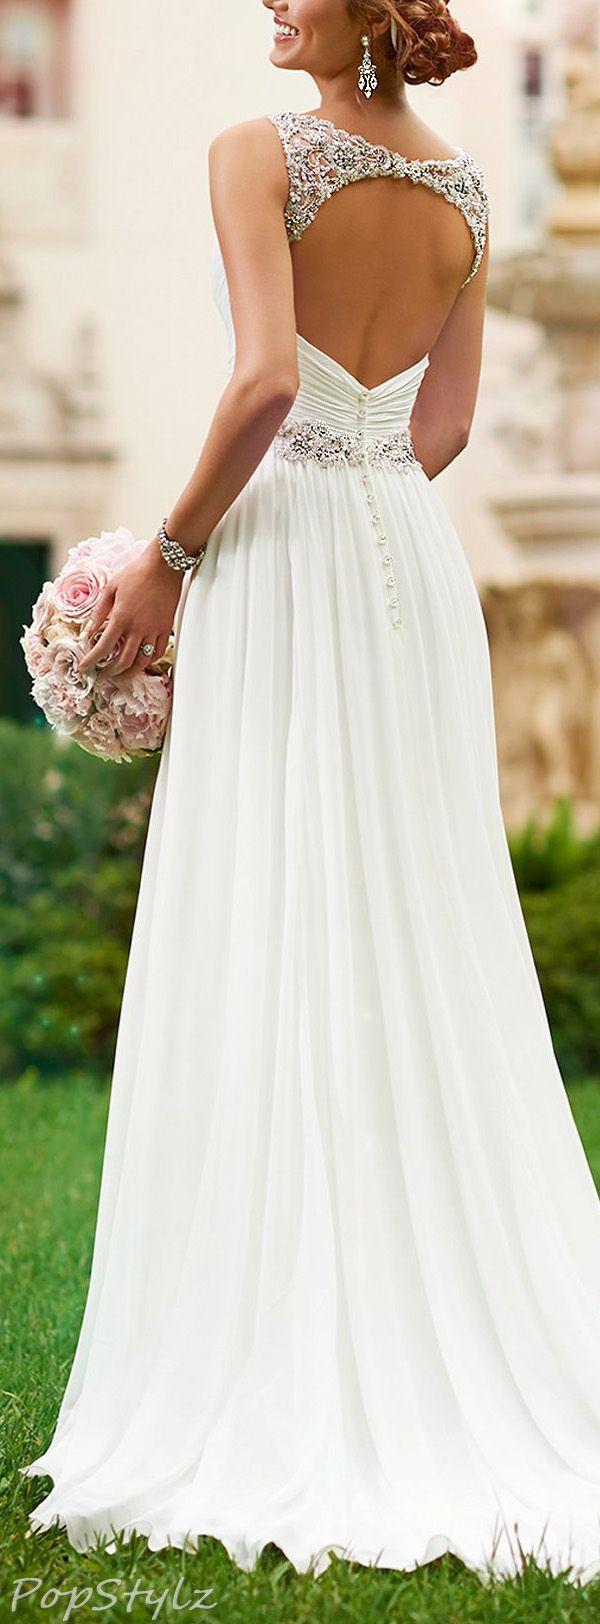 Wedding - Dresses Page 457